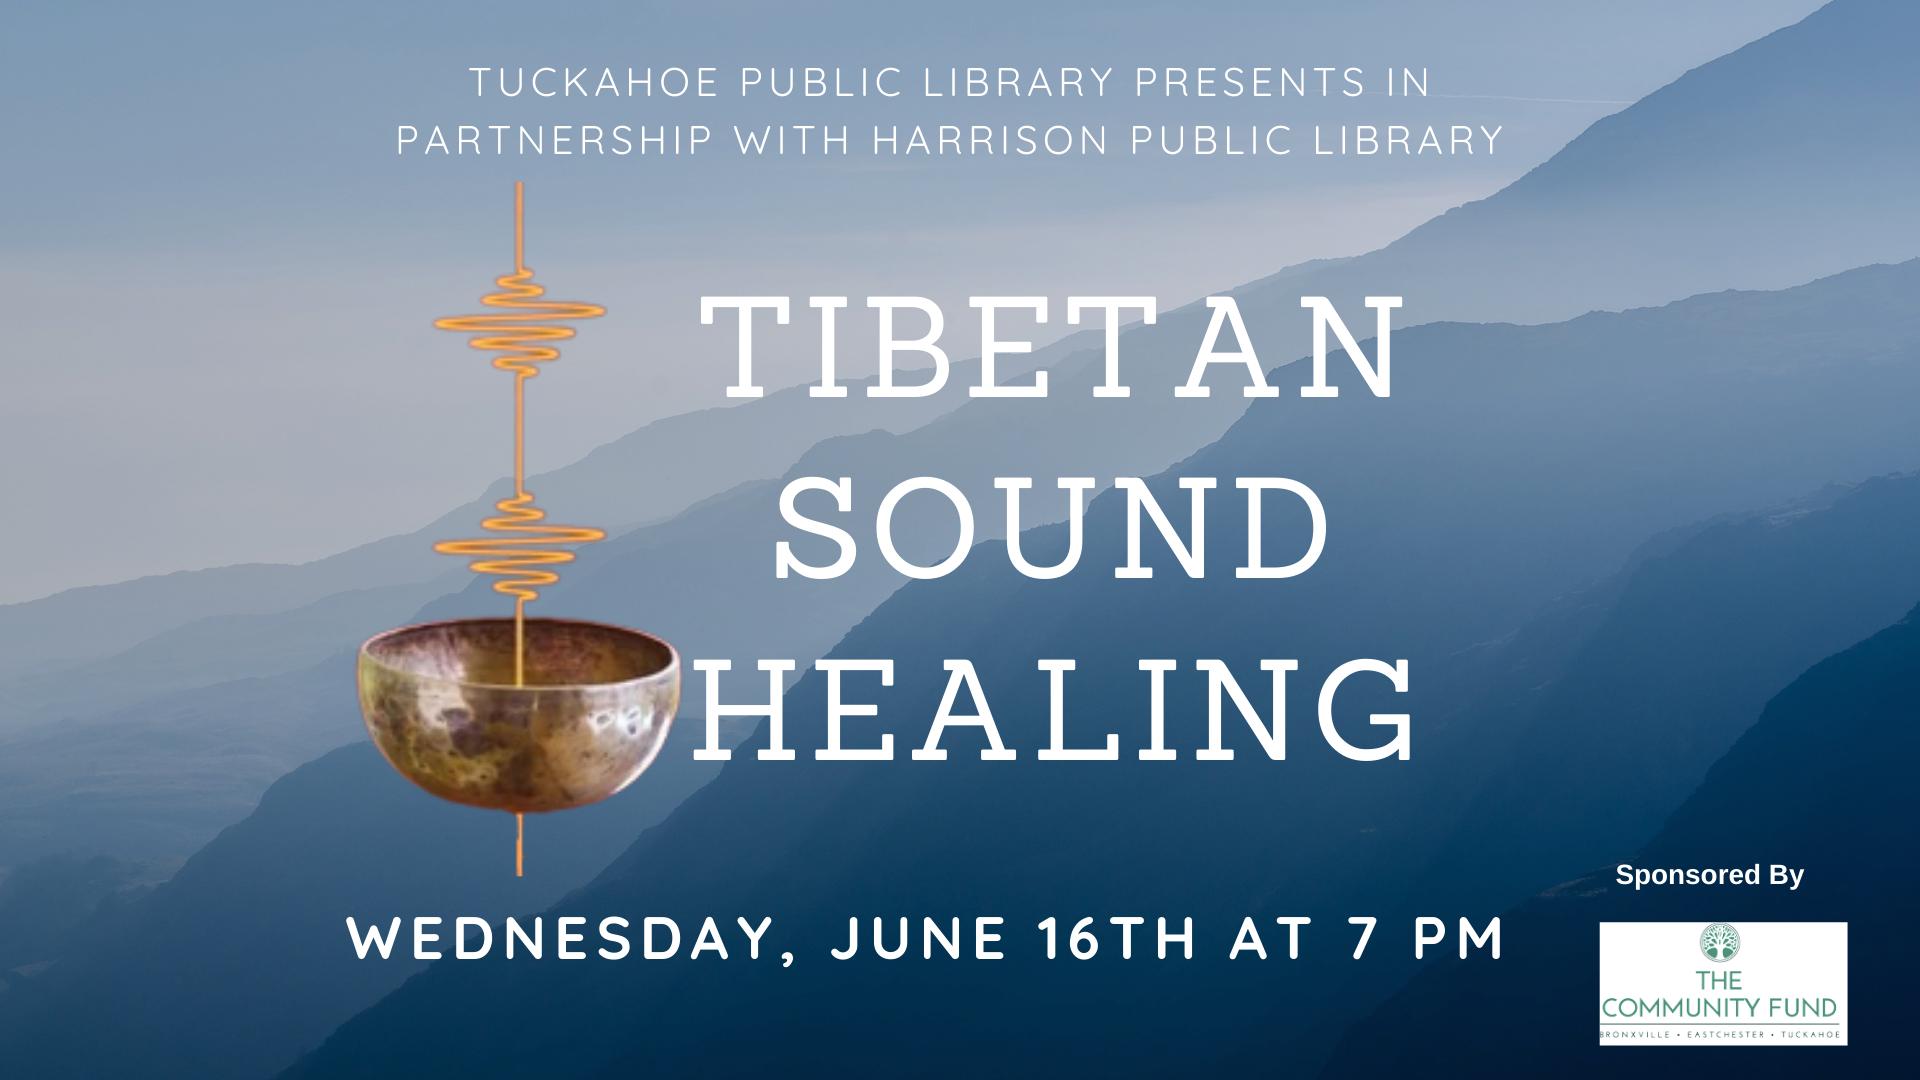 Tibetan Sound Healing